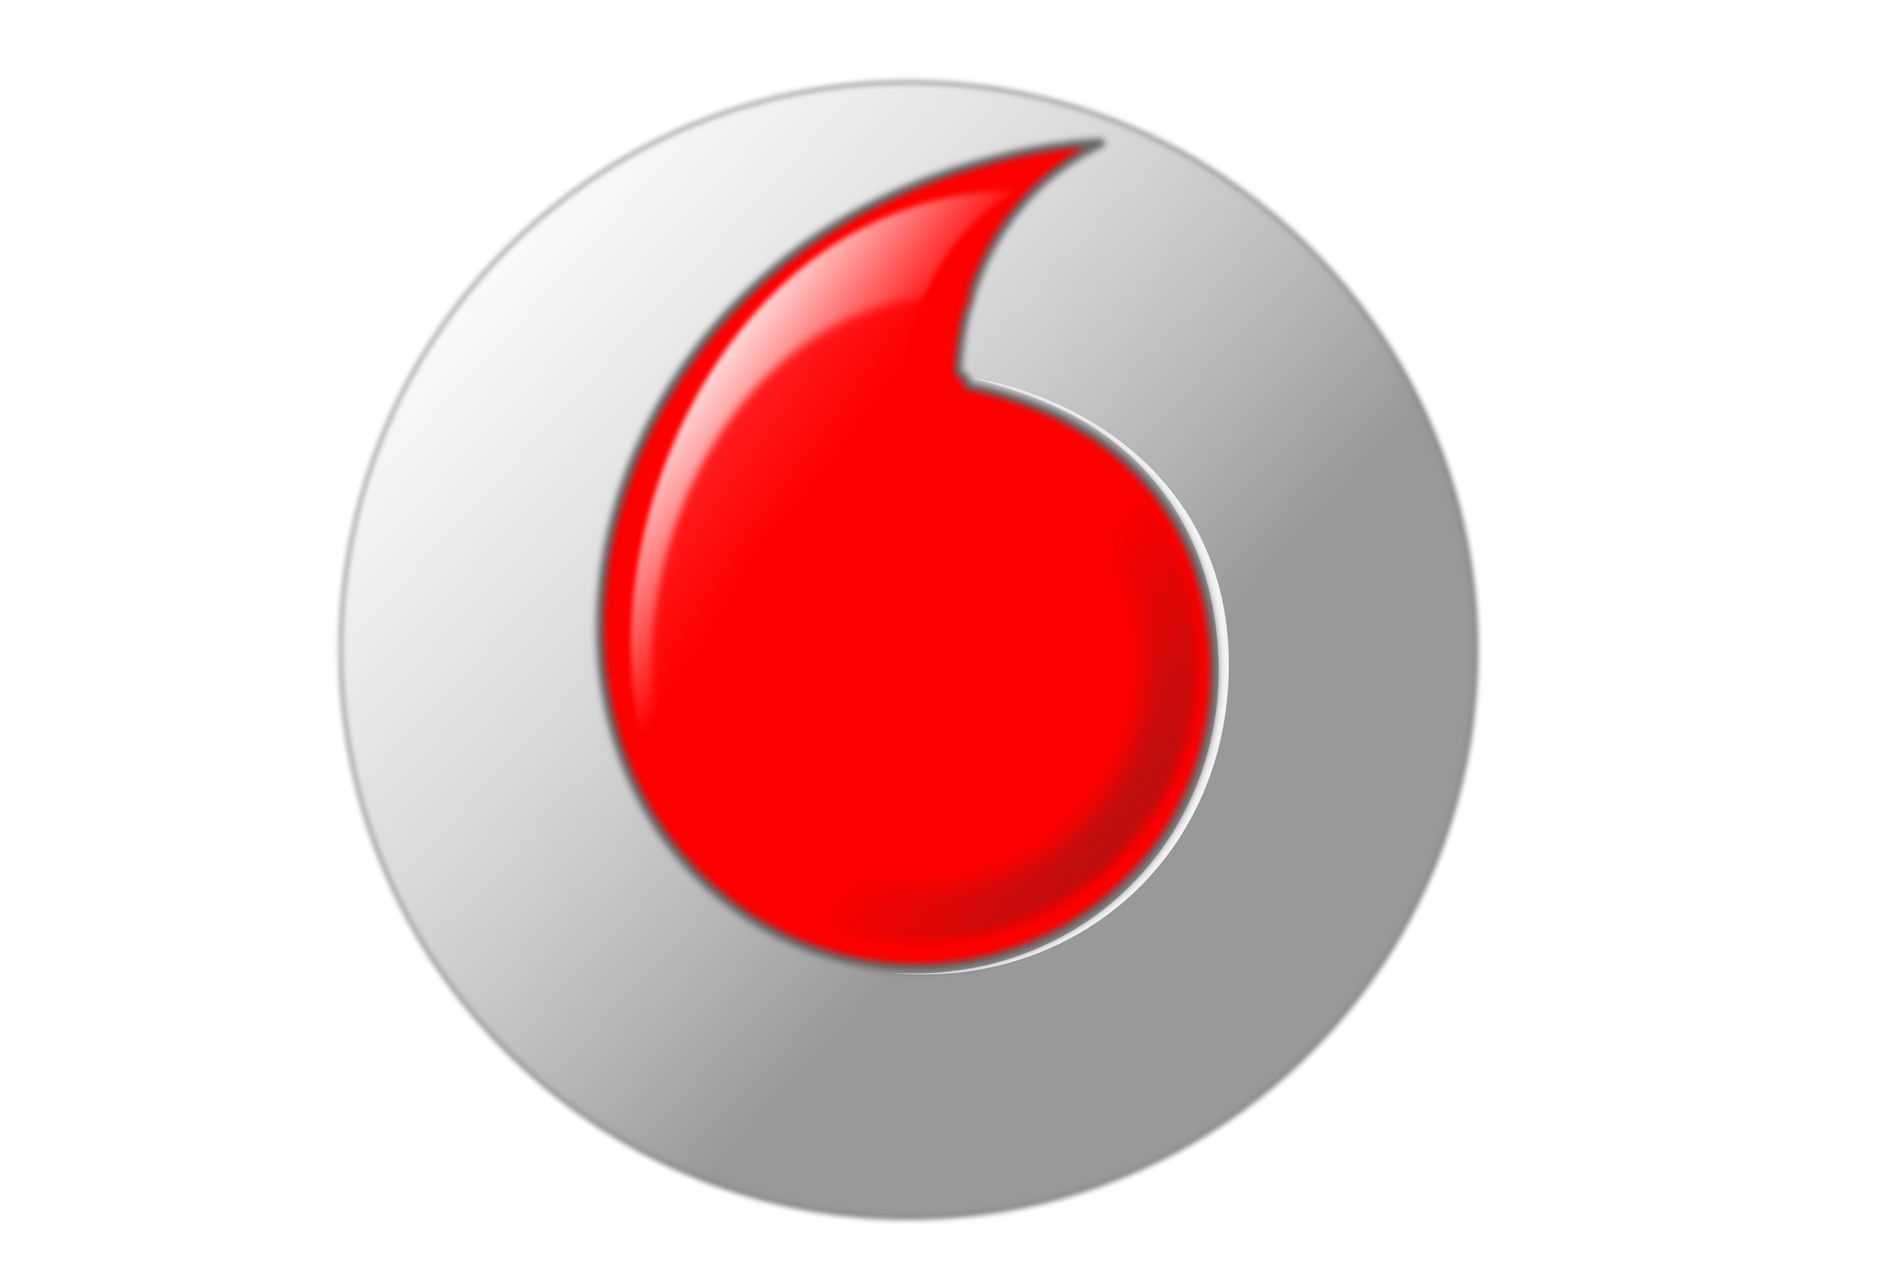 Vodafone PNG Transparent Vodafone.PNG Images. | PlusPNG